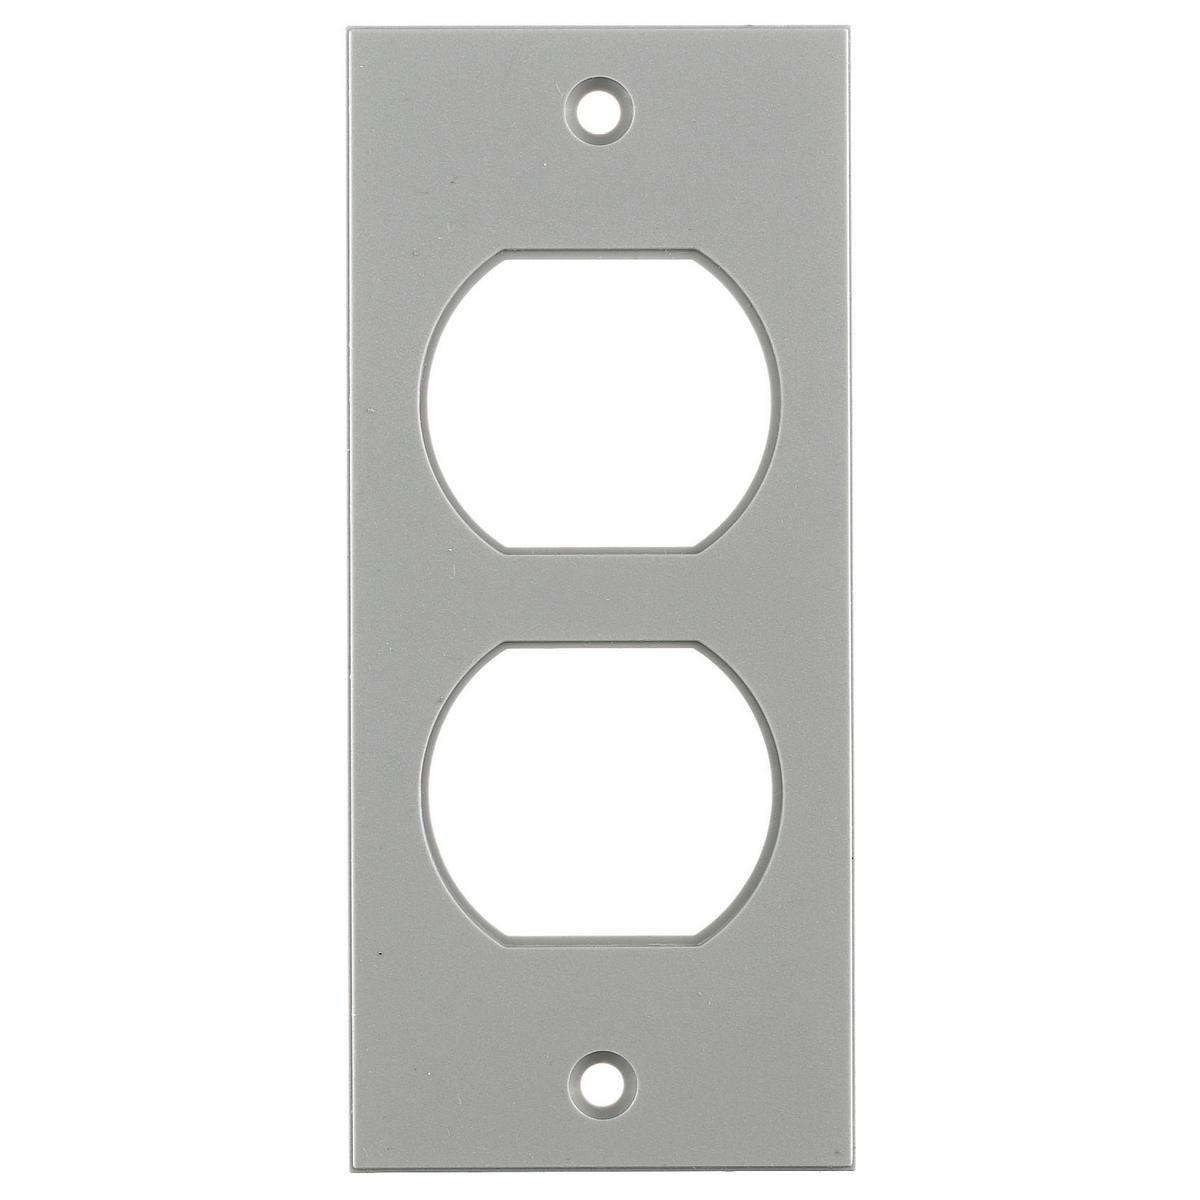 Hubbell HBLST302SGY 2 x 4.5 Inch Gray Duplex Screw Type Face Plate